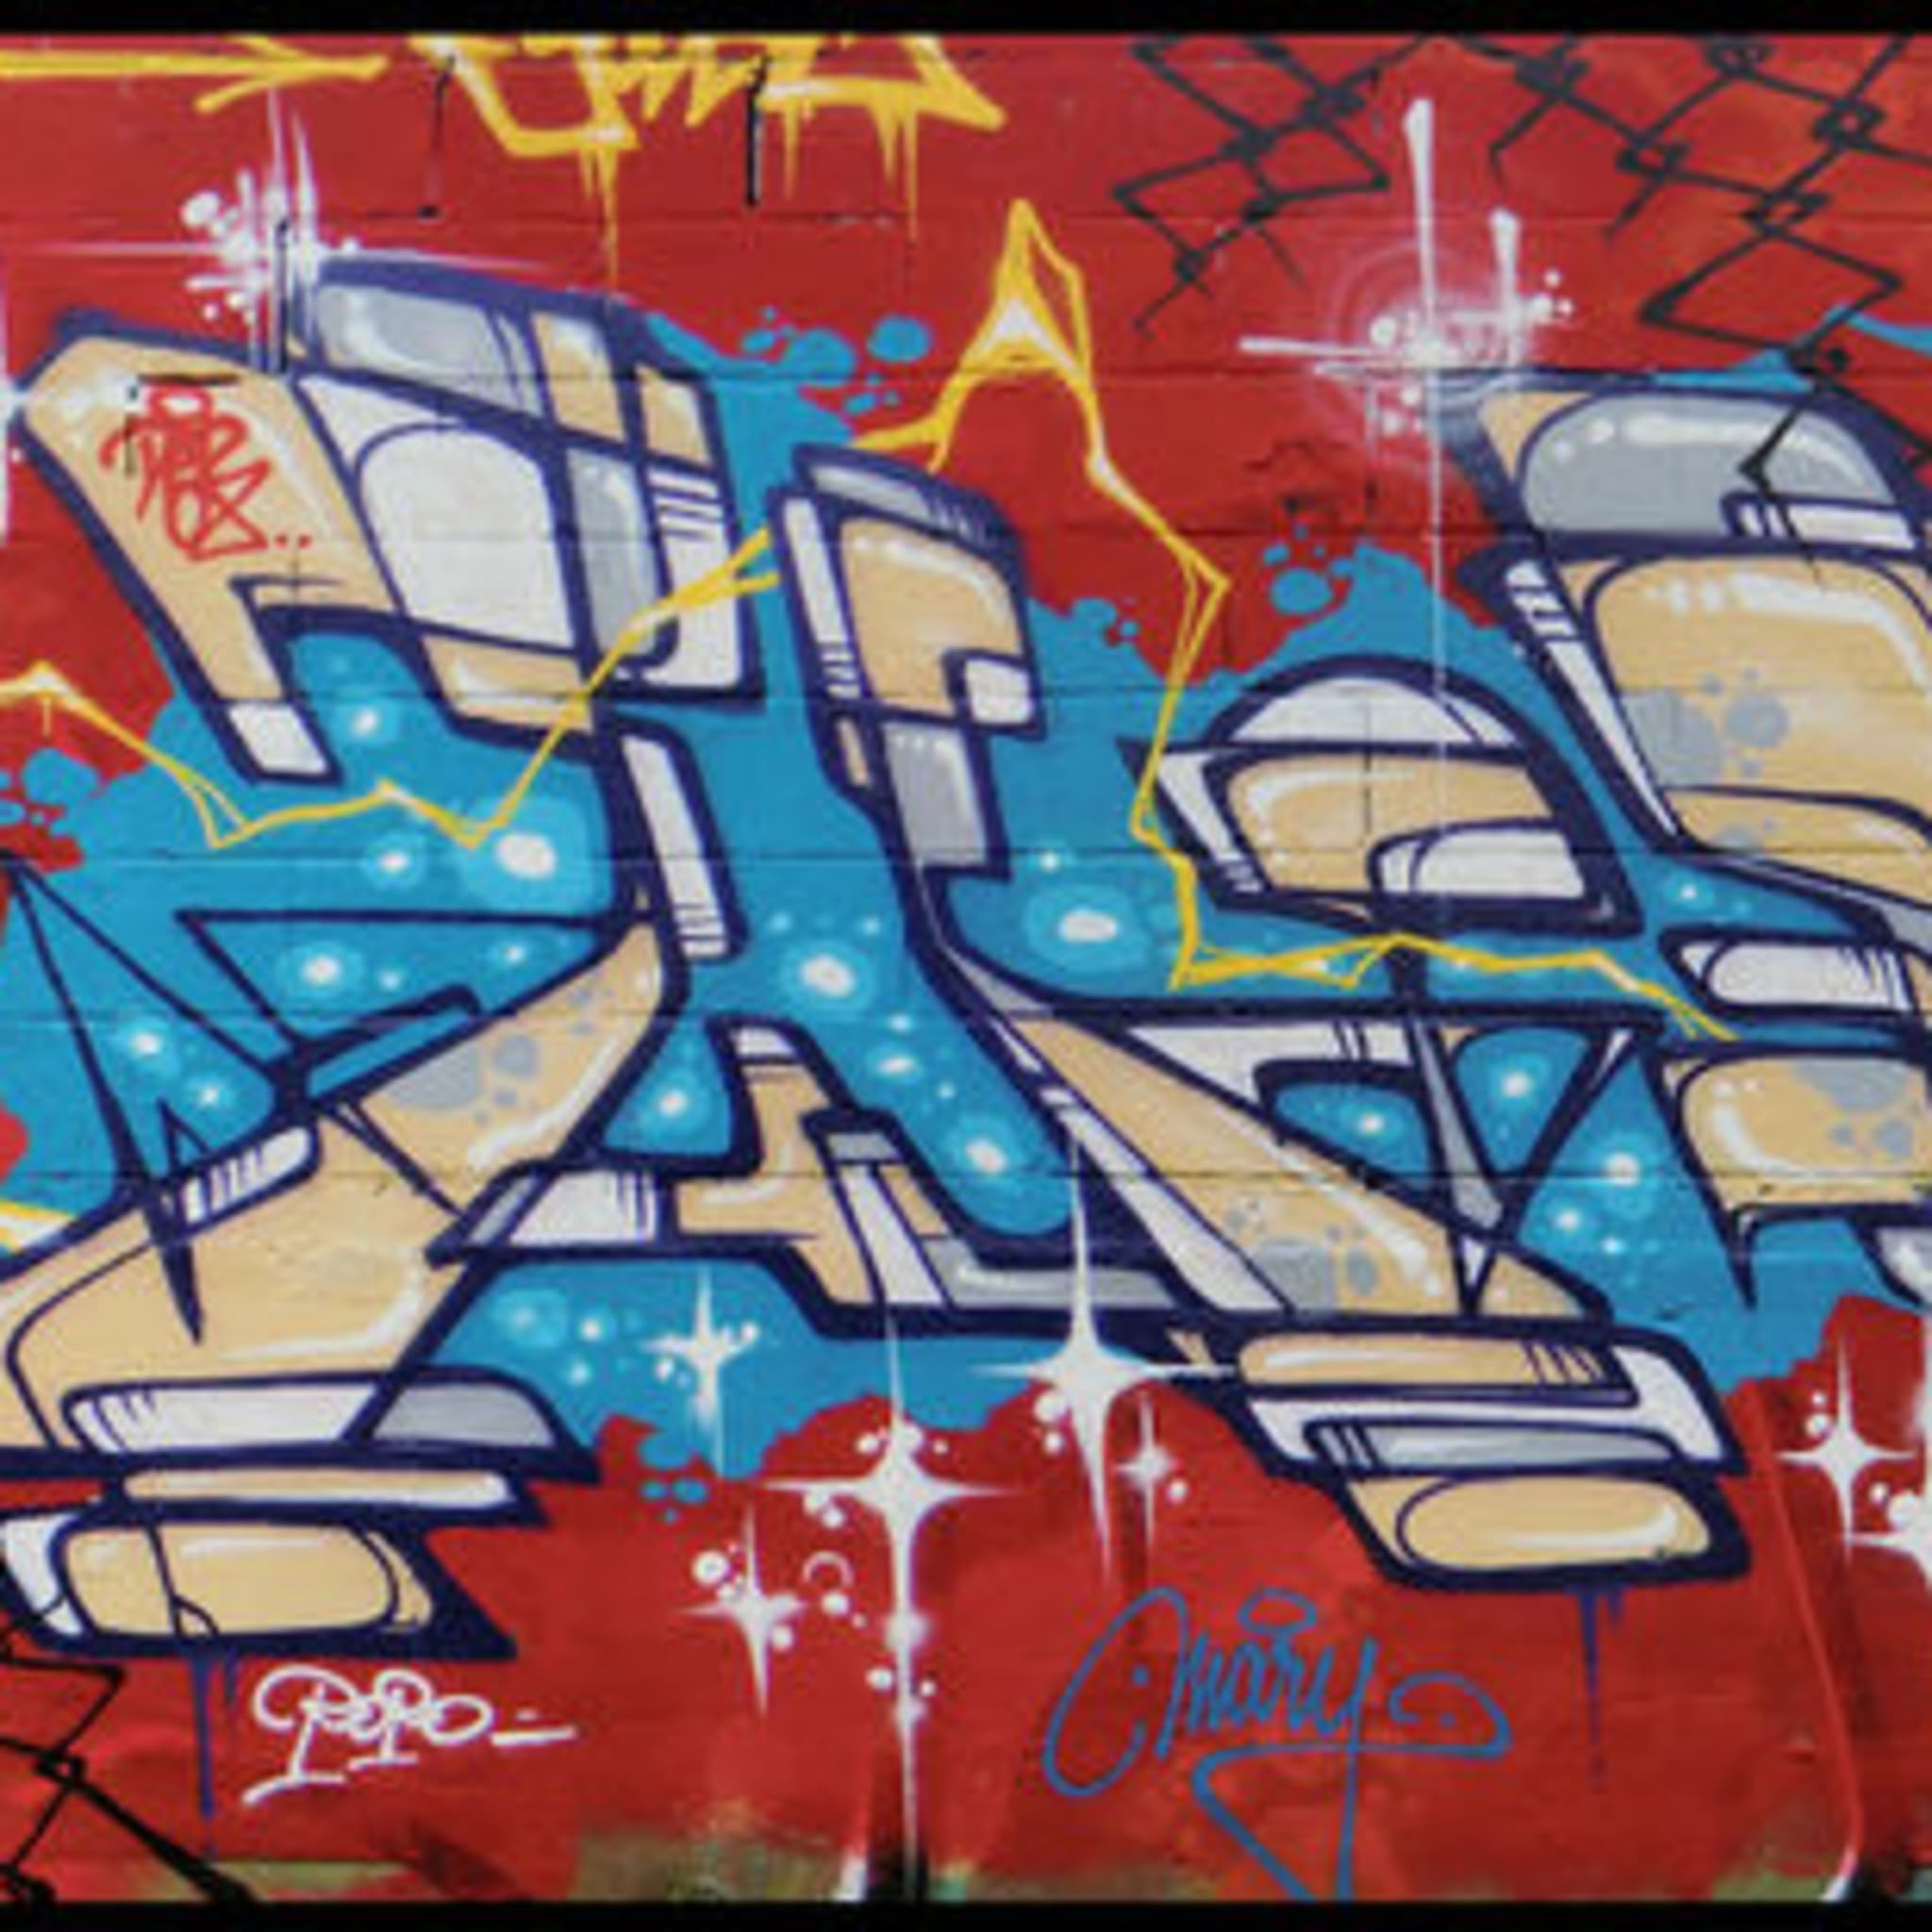 Artwork By Julien Seth Mailland in Bobigny